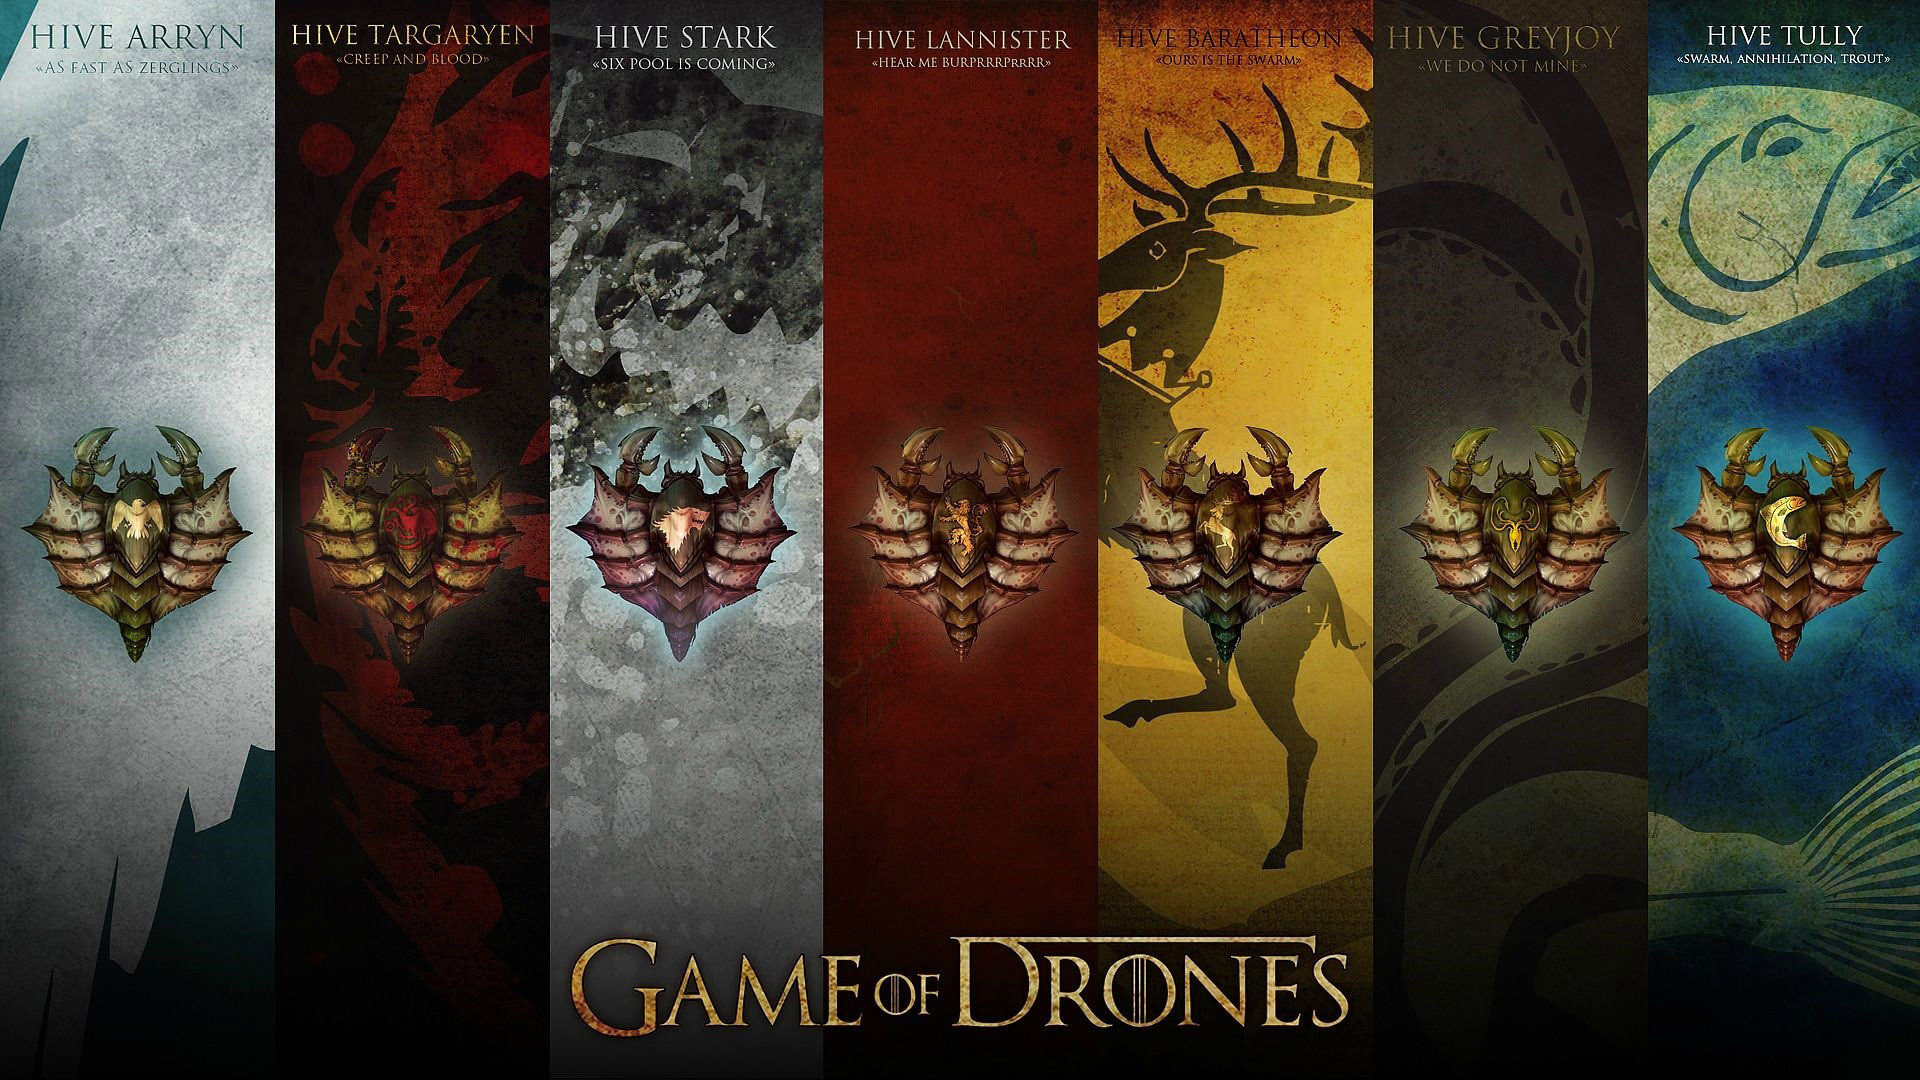 Filename: starcraft-game-of-thrones-crossover-15385.jpg